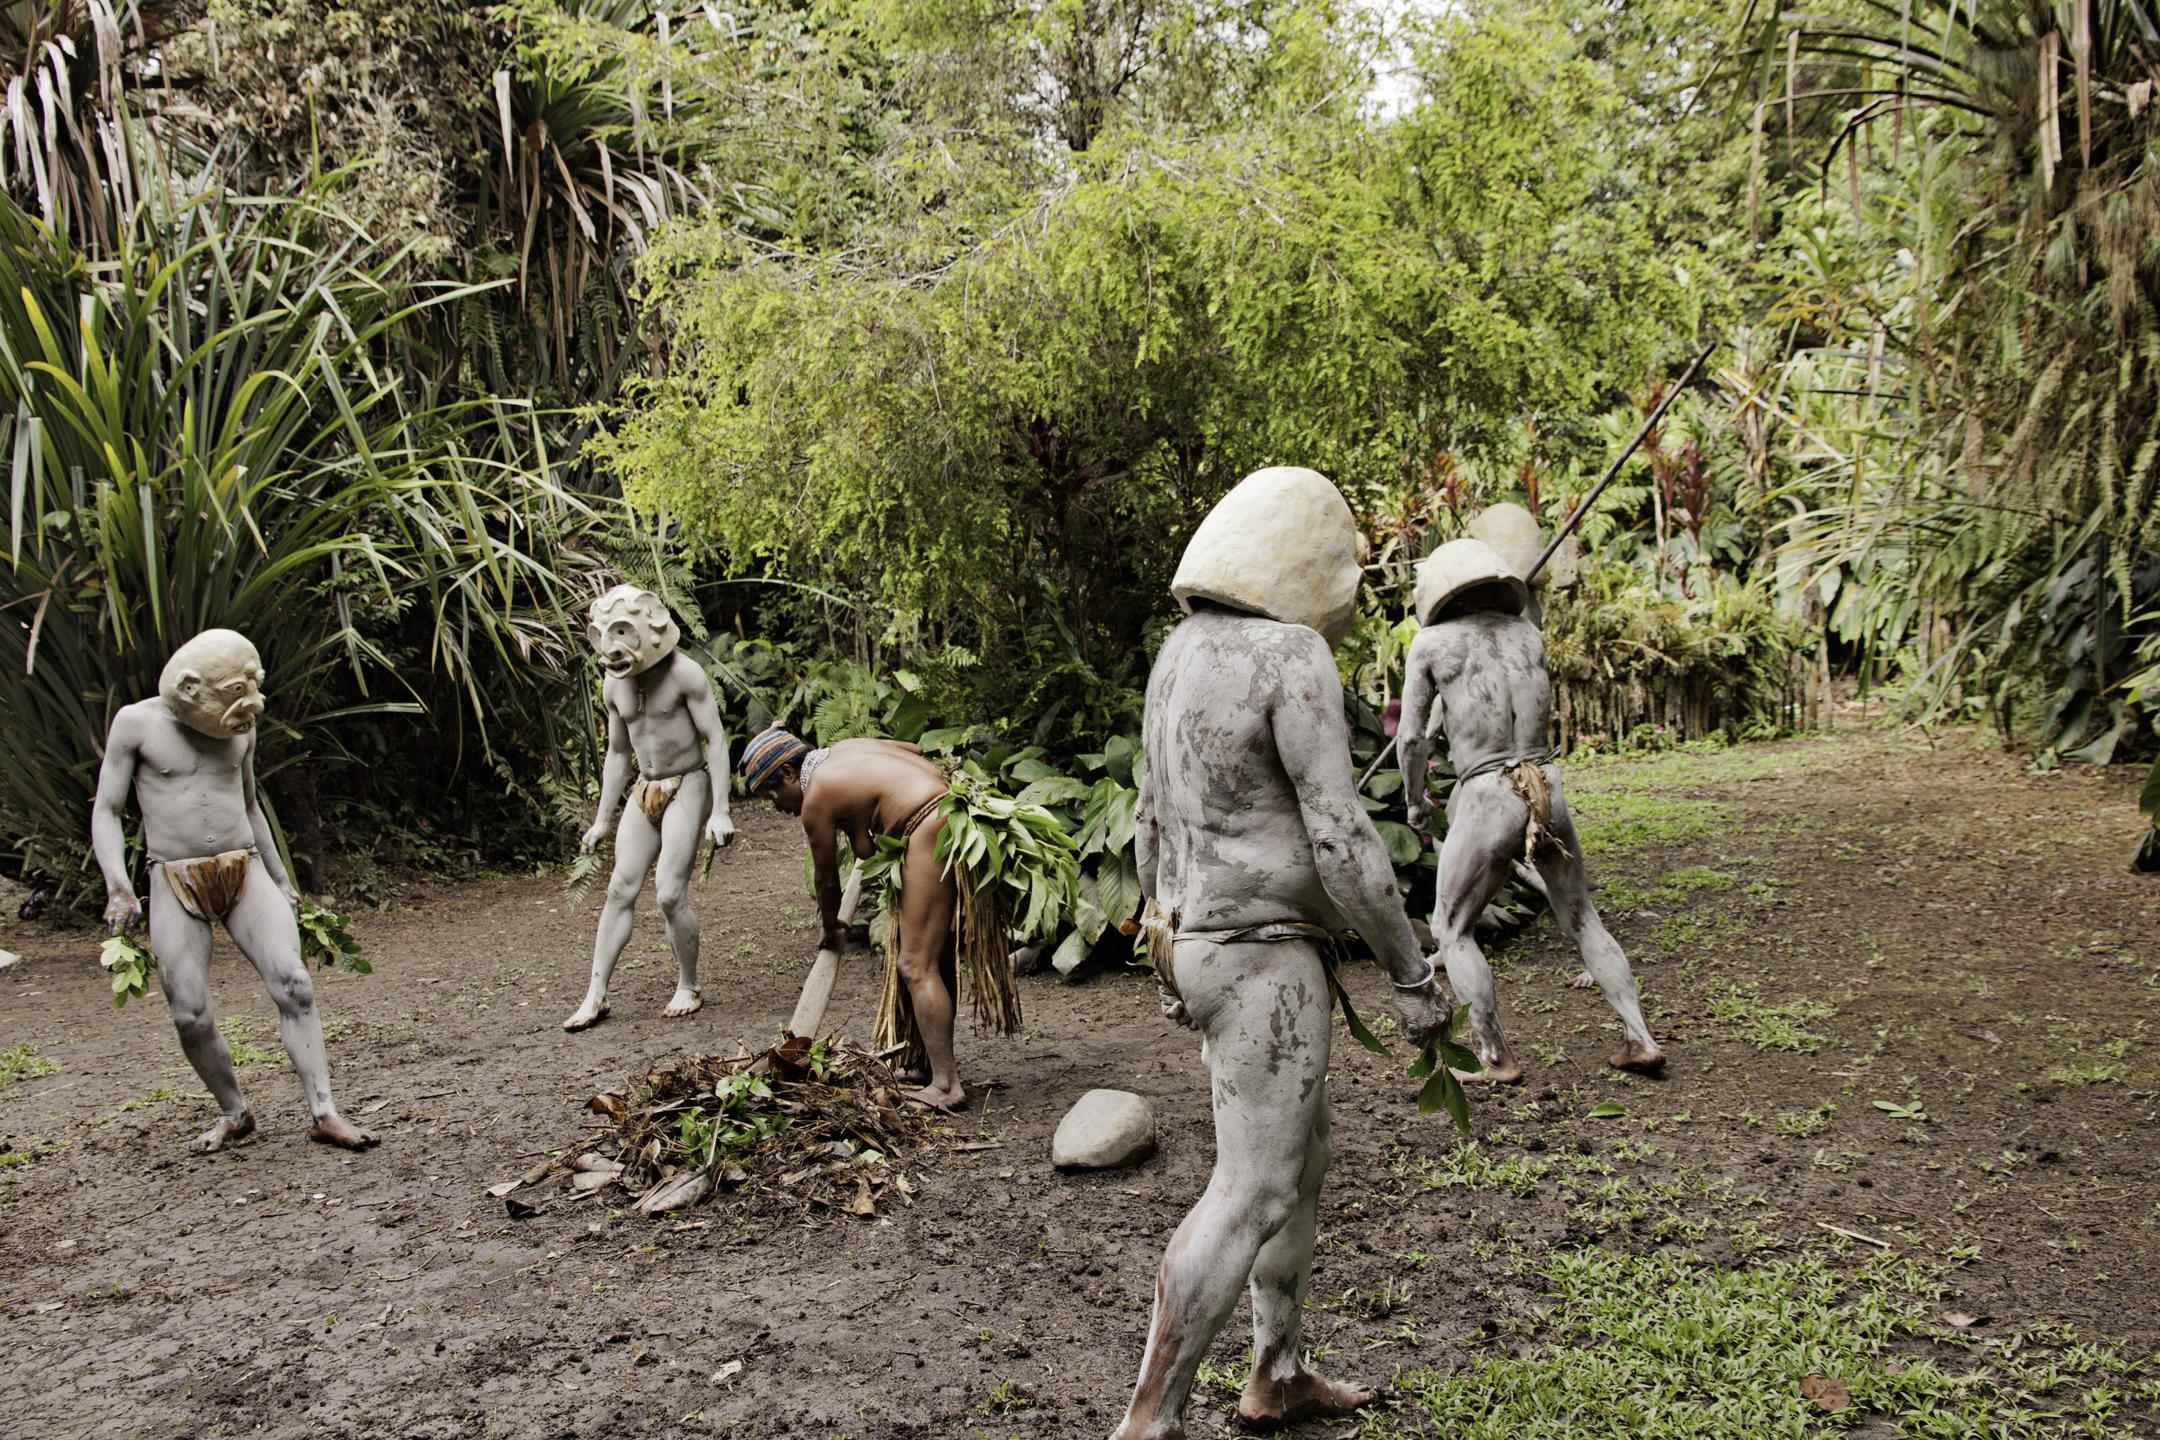 Reenactment of the Pogla Mudmen retaking their village